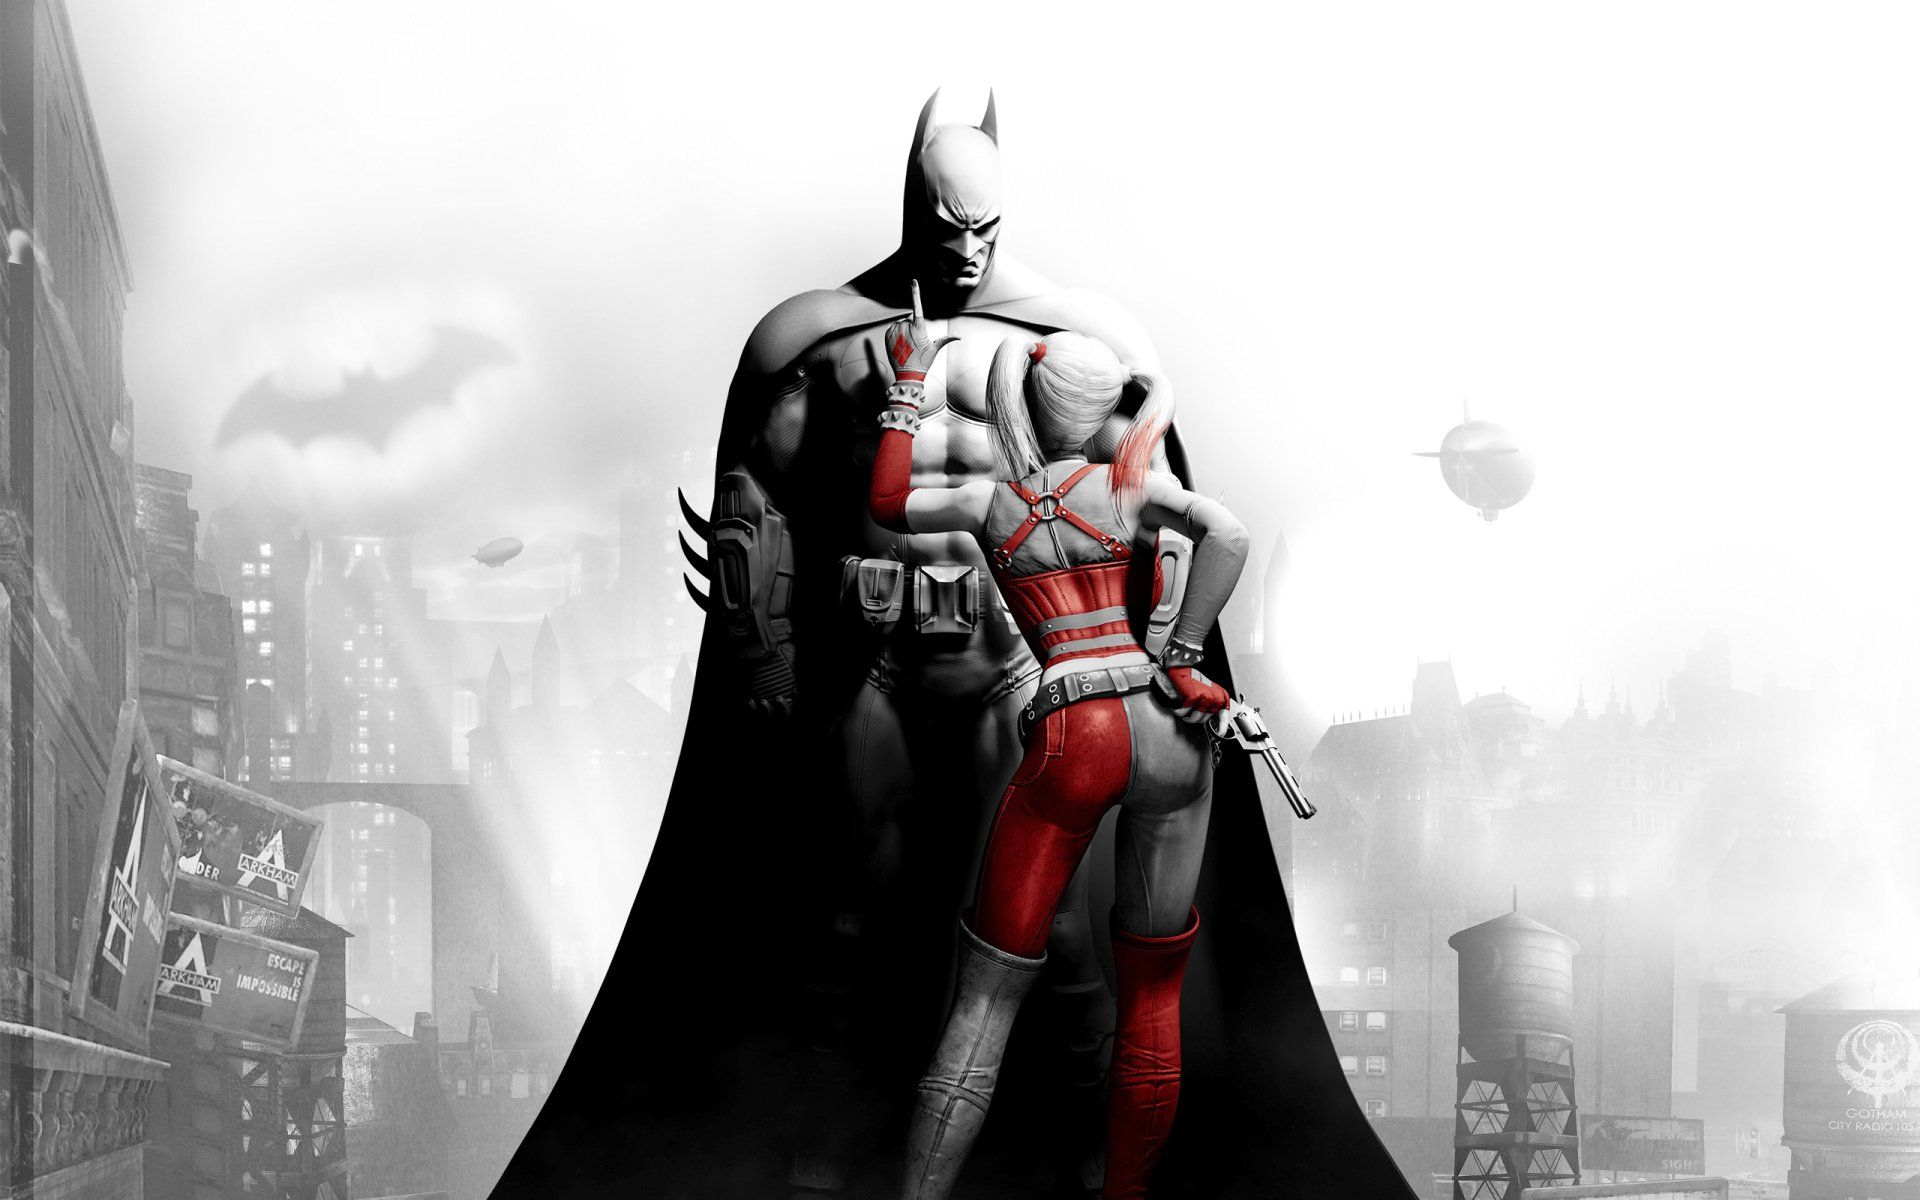 Batman Desktop Backgrounds Batman Arkham City Wallpaper Hd 1080p